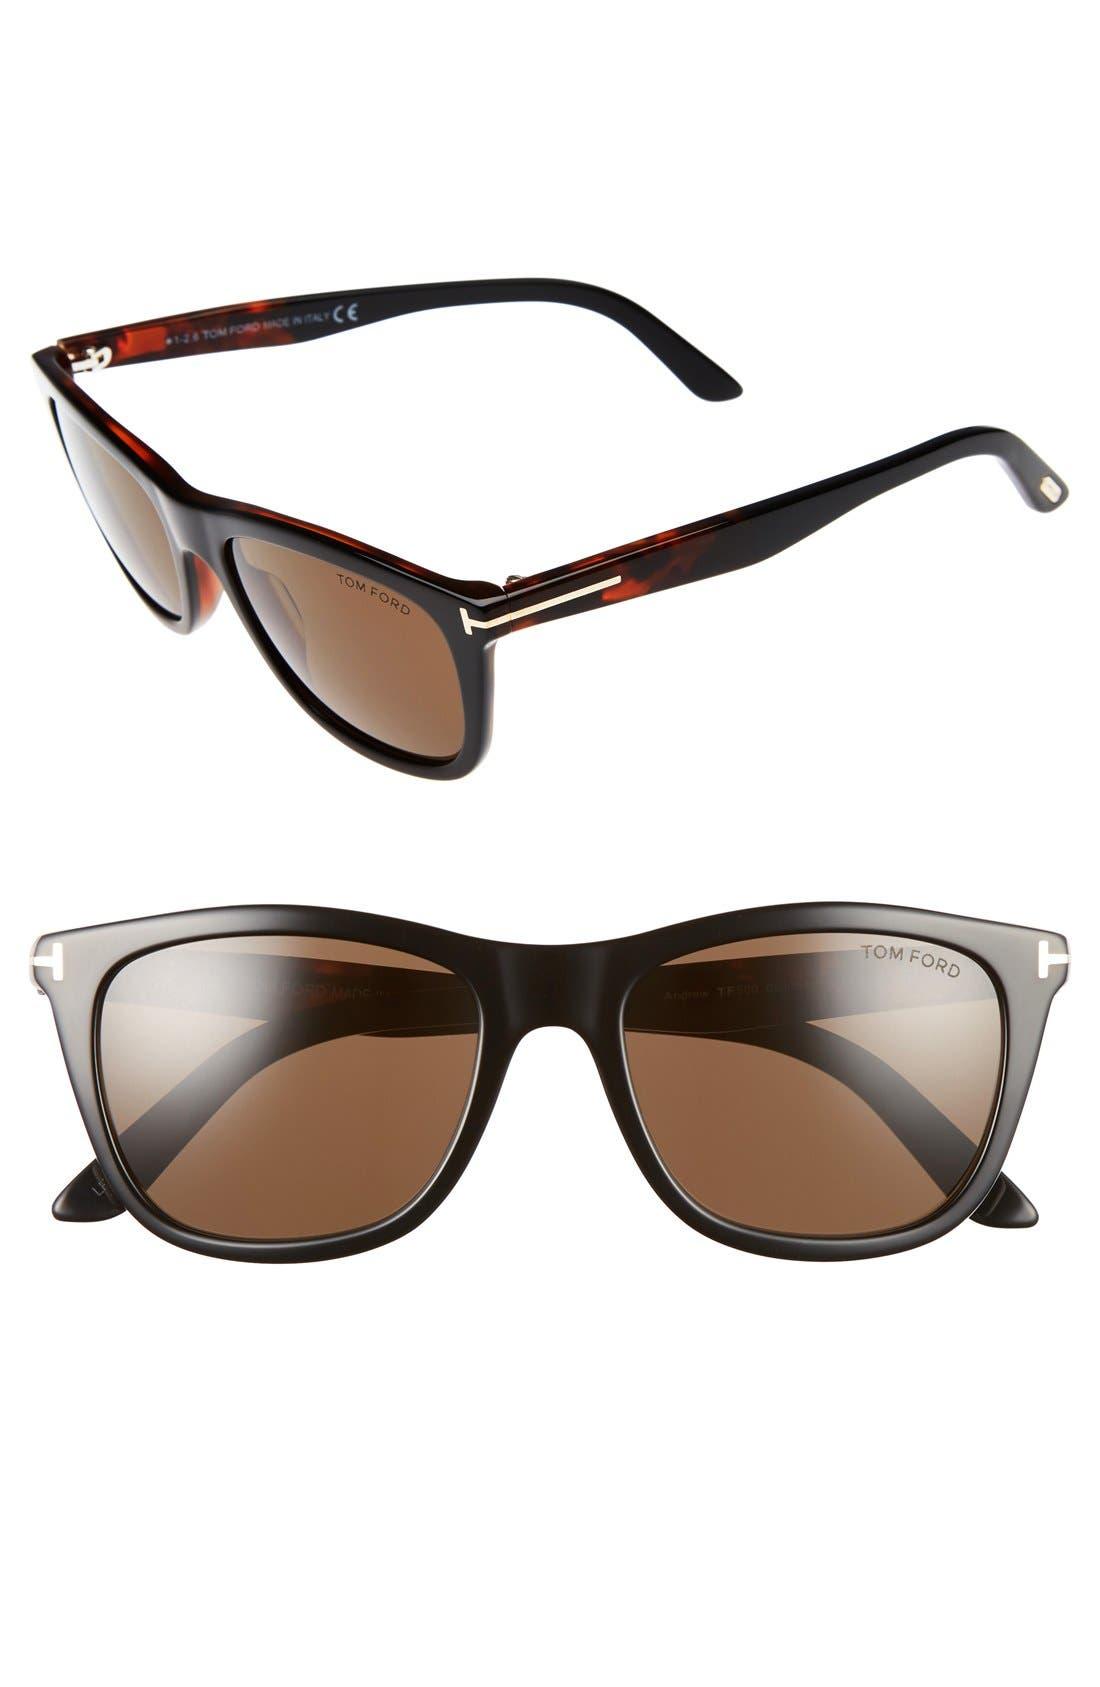 Andrew 54mm Sunglasses,                             Main thumbnail 1, color,                             001